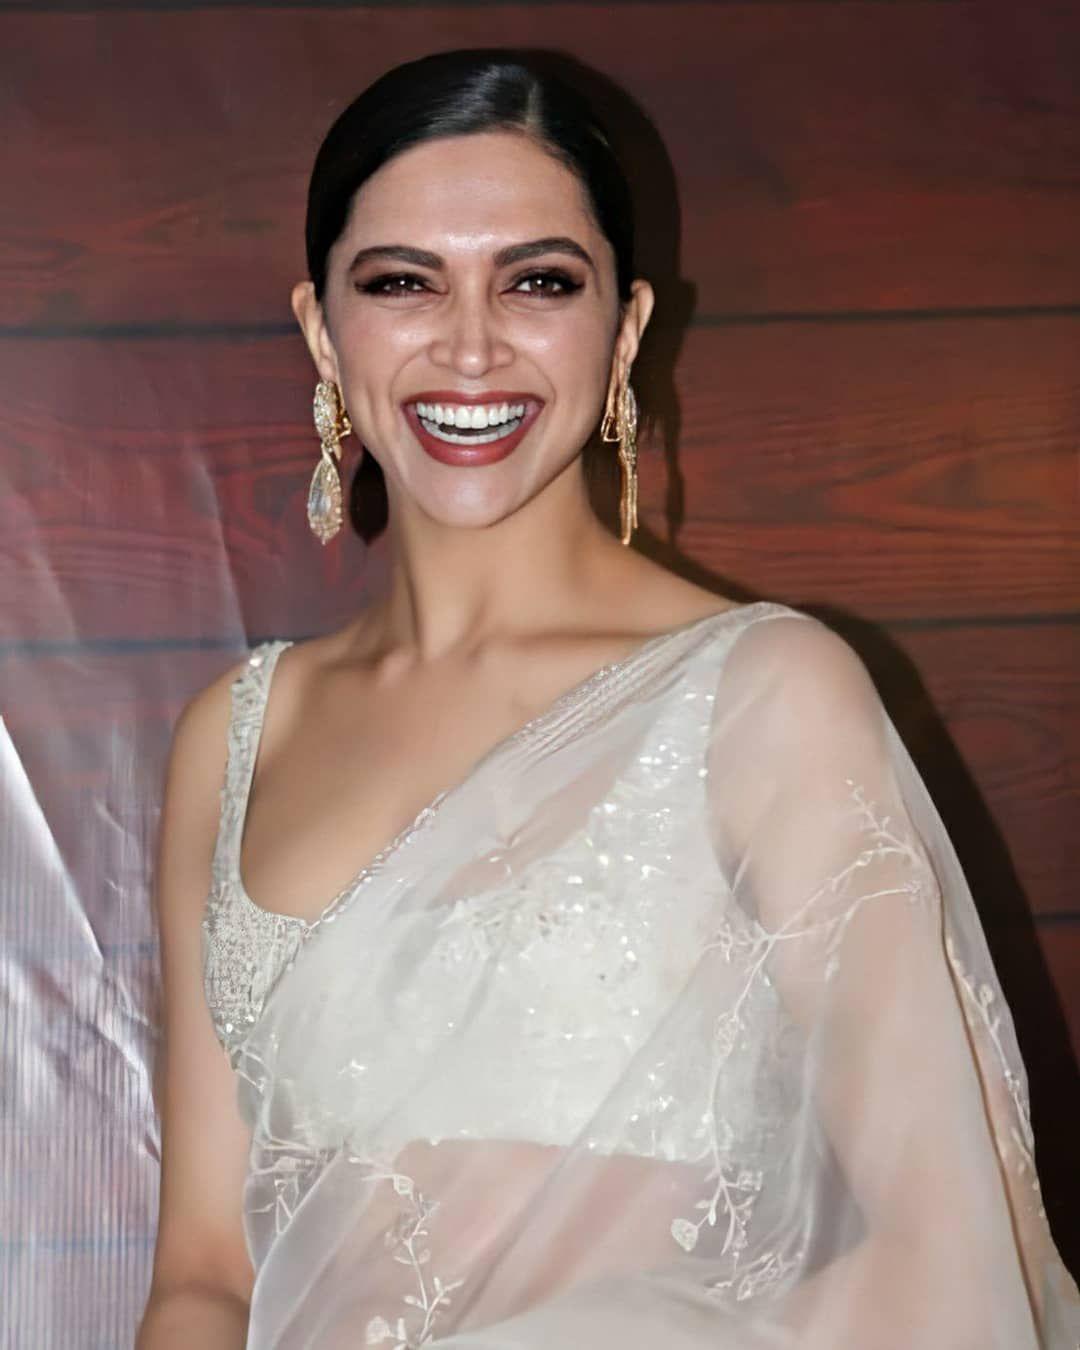 Deepika padukone looks divine as she turns up for javed